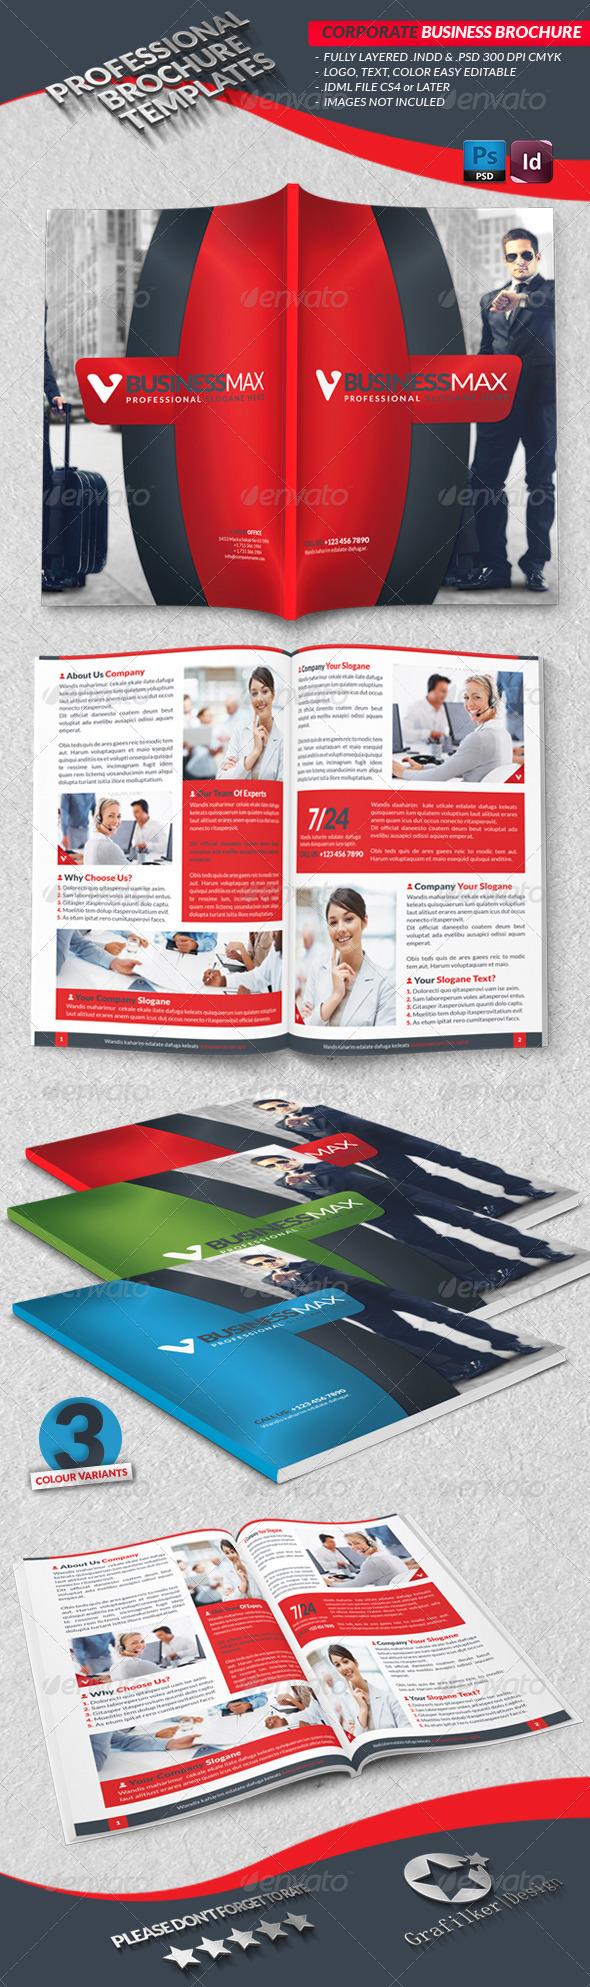 GraphicRiver Corporate Business Brochure 3860299